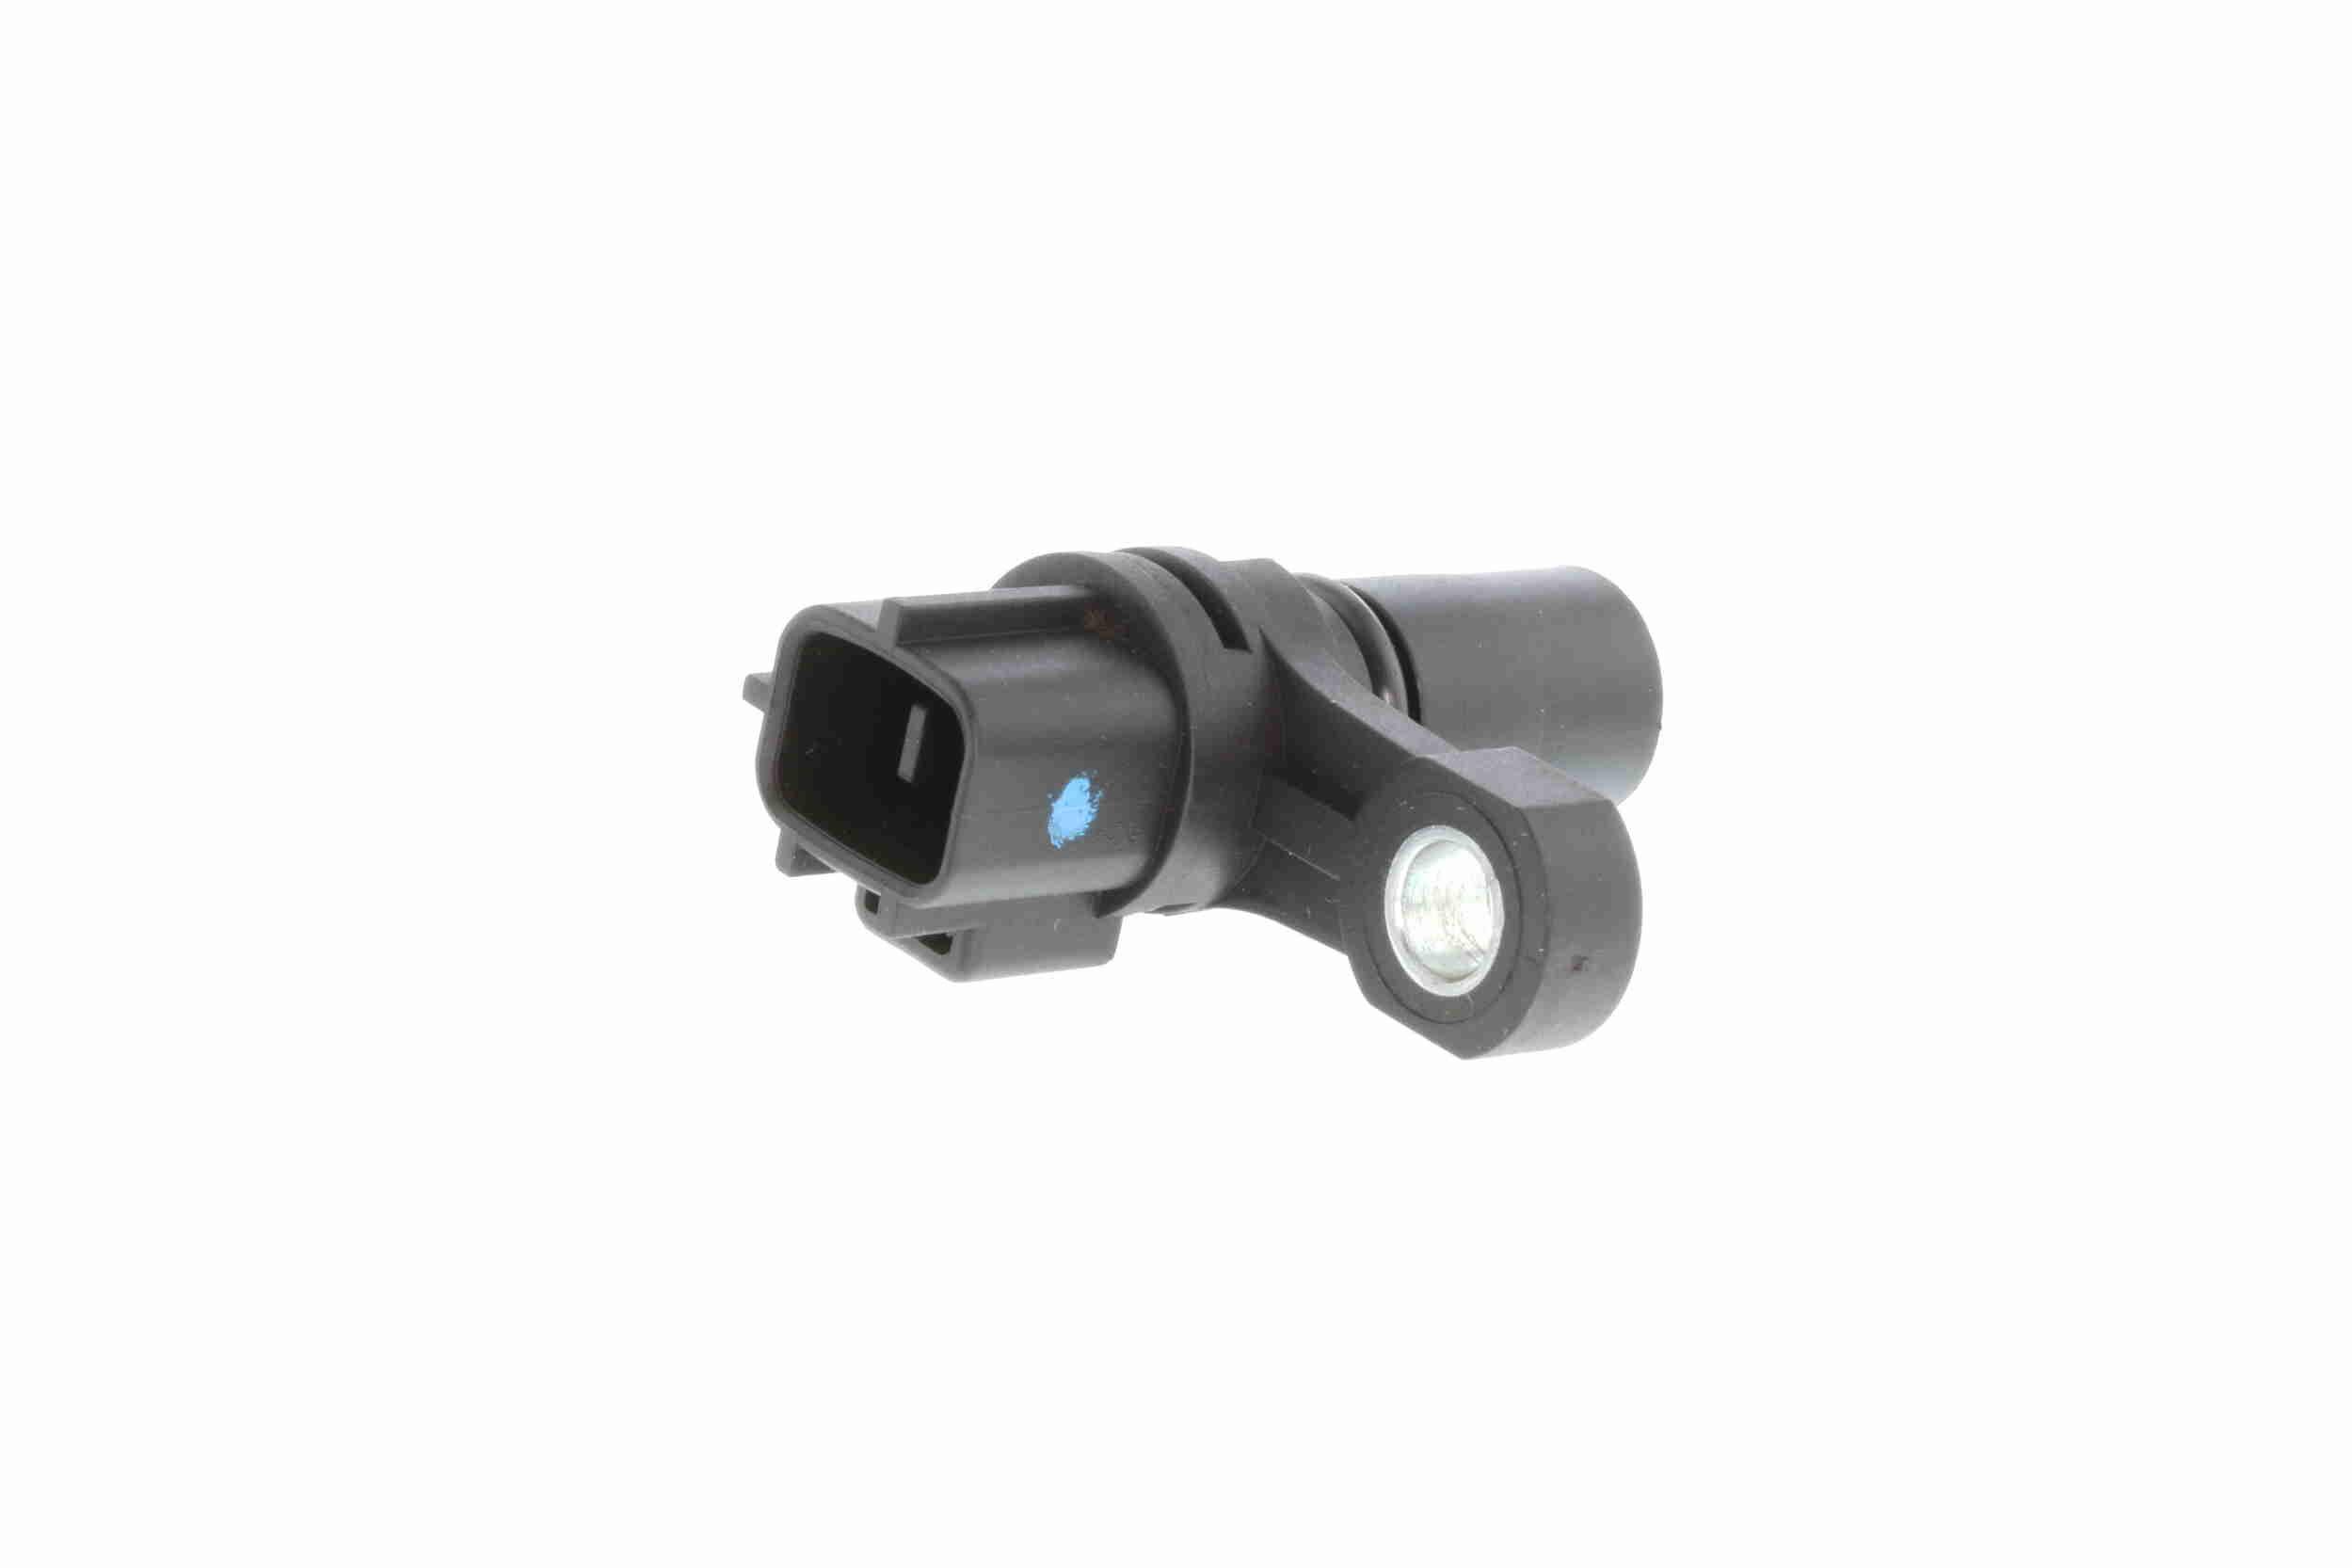 OPEL CORSA 2008 Geschwindigkeitssensor - Original VEMO V40-72-0586